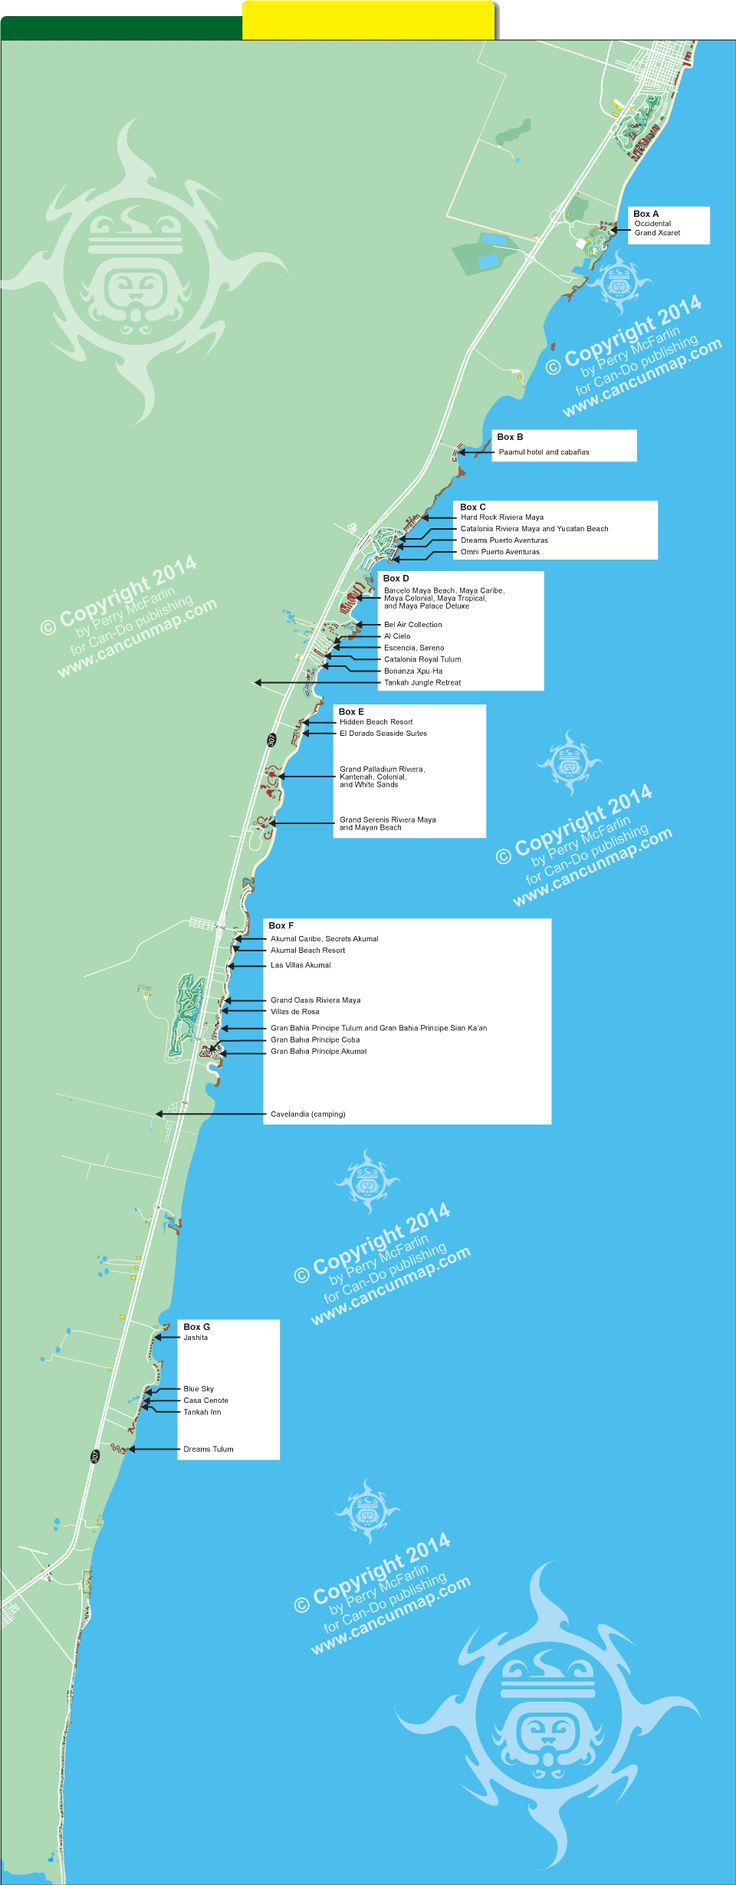 Map of Riviera Maya hotel locations